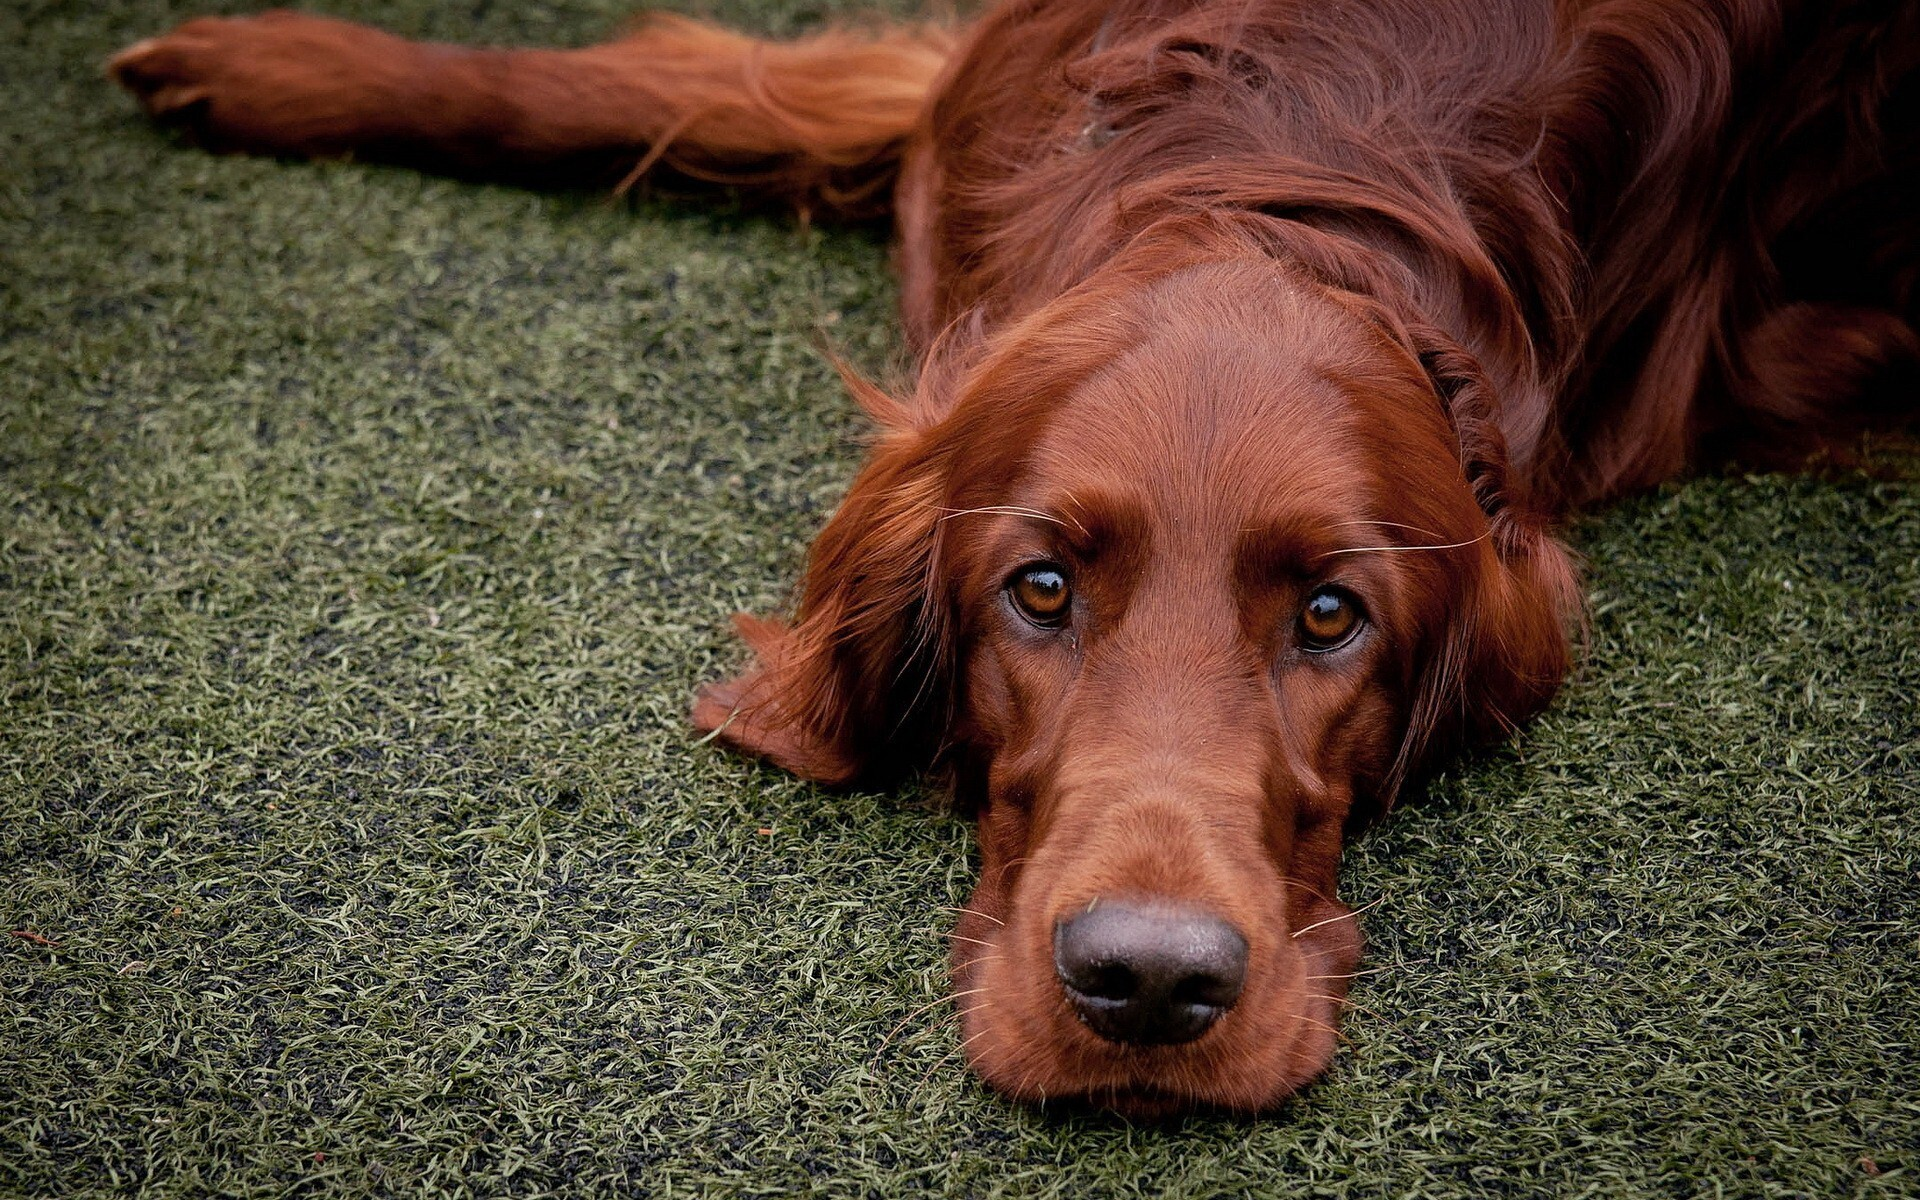 Big Dog In Home Garden Wallpaper Hd Wallpapers